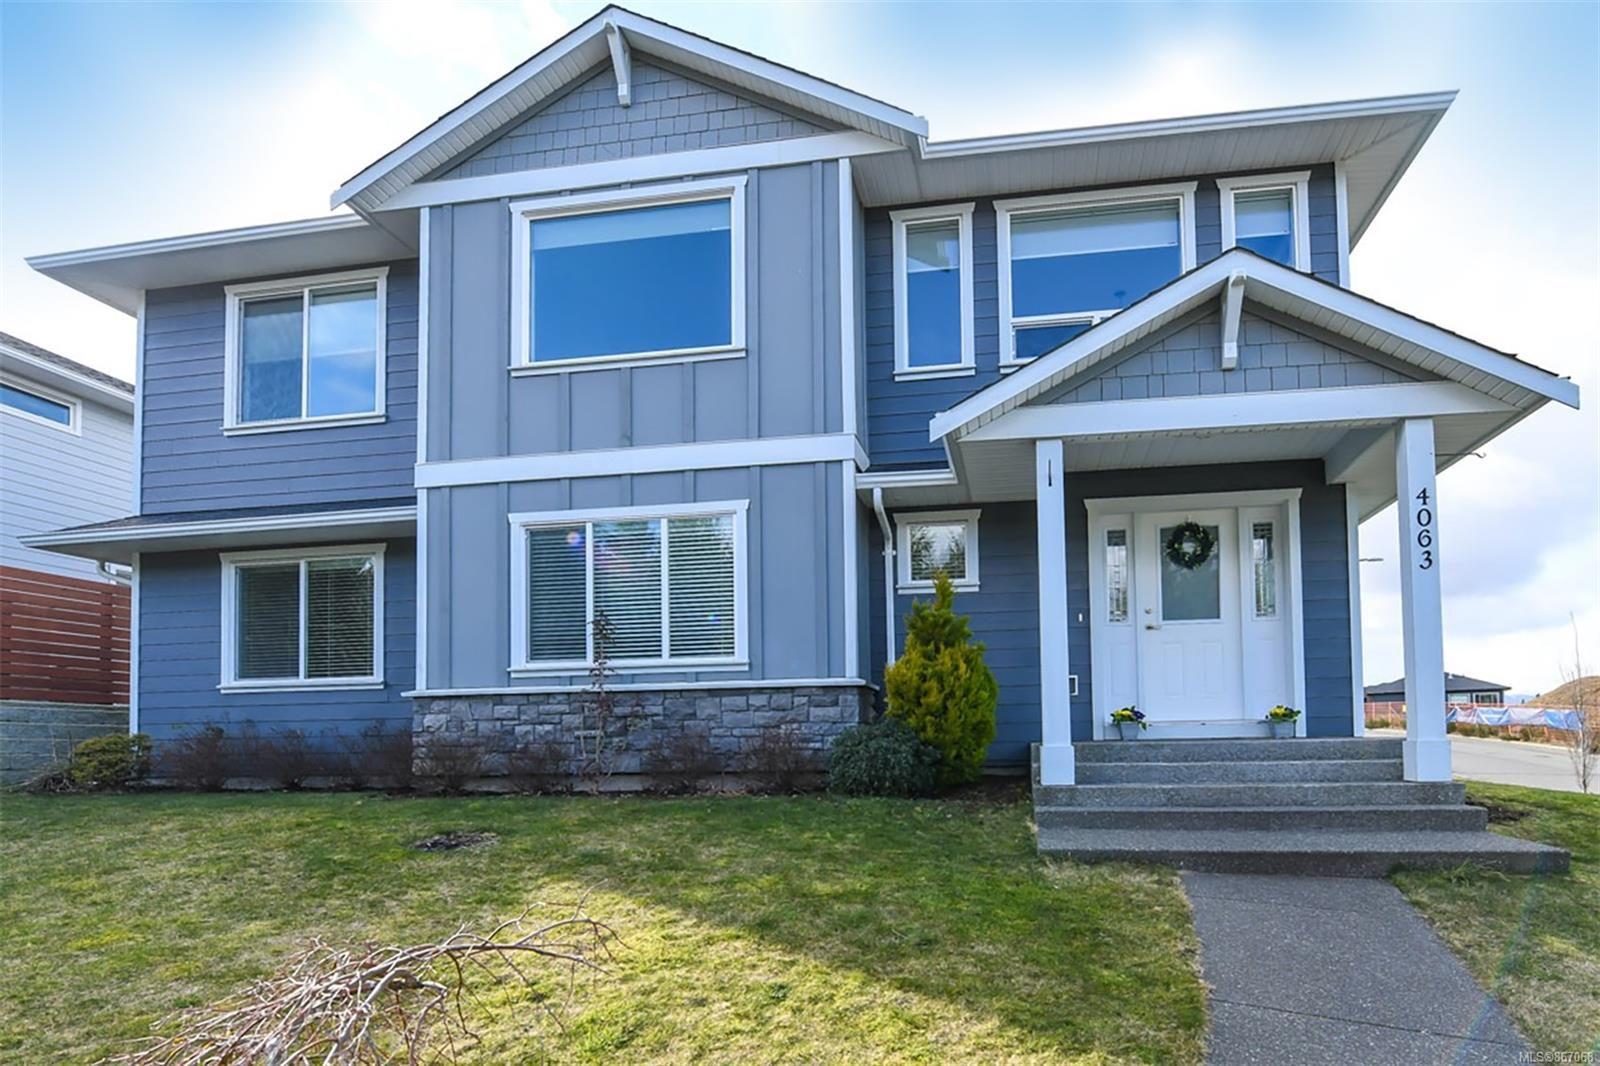 Main Photo: 4063 Buckstone Rd in : CV Courtenay City House for sale (Comox Valley)  : MLS®# 867068